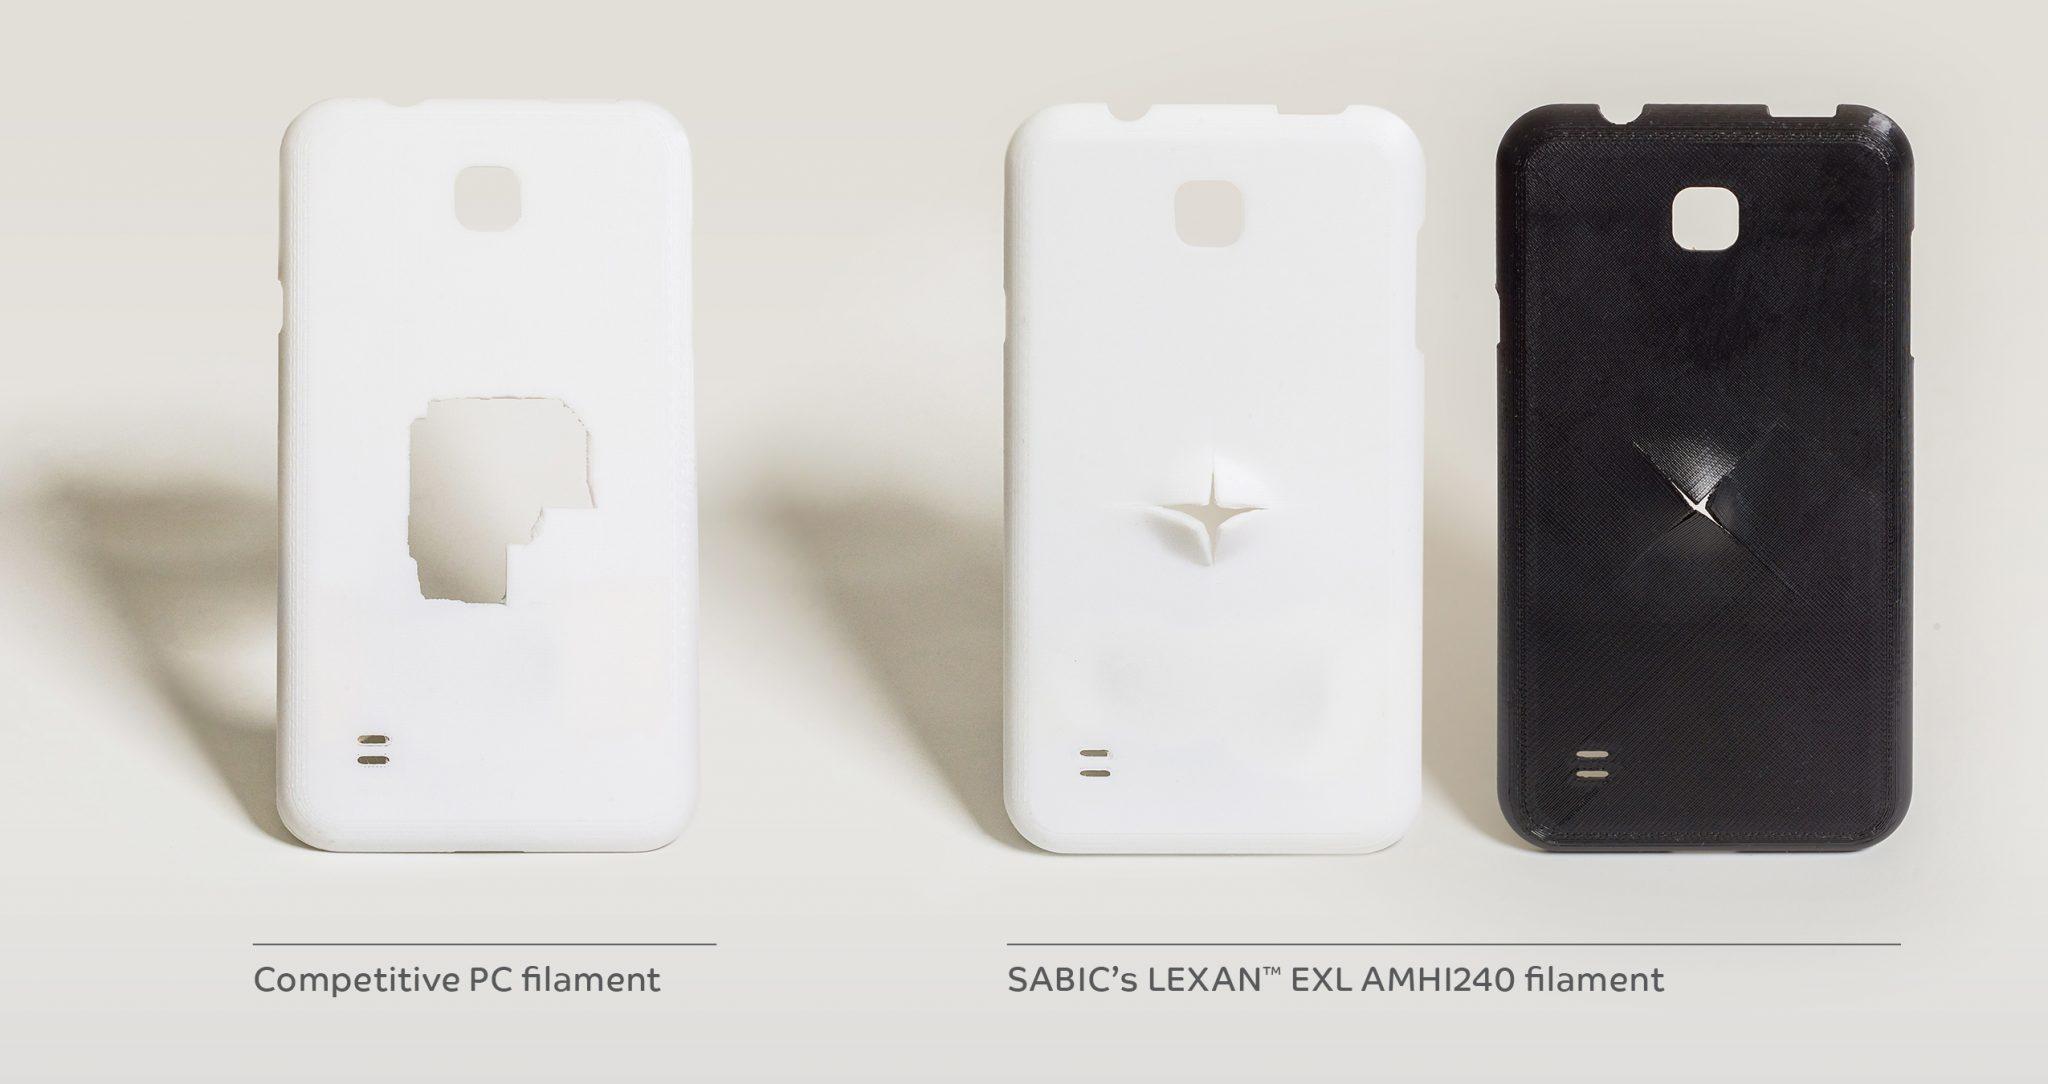 Roboze adopts leading SABIC filament for FFF 3D printers